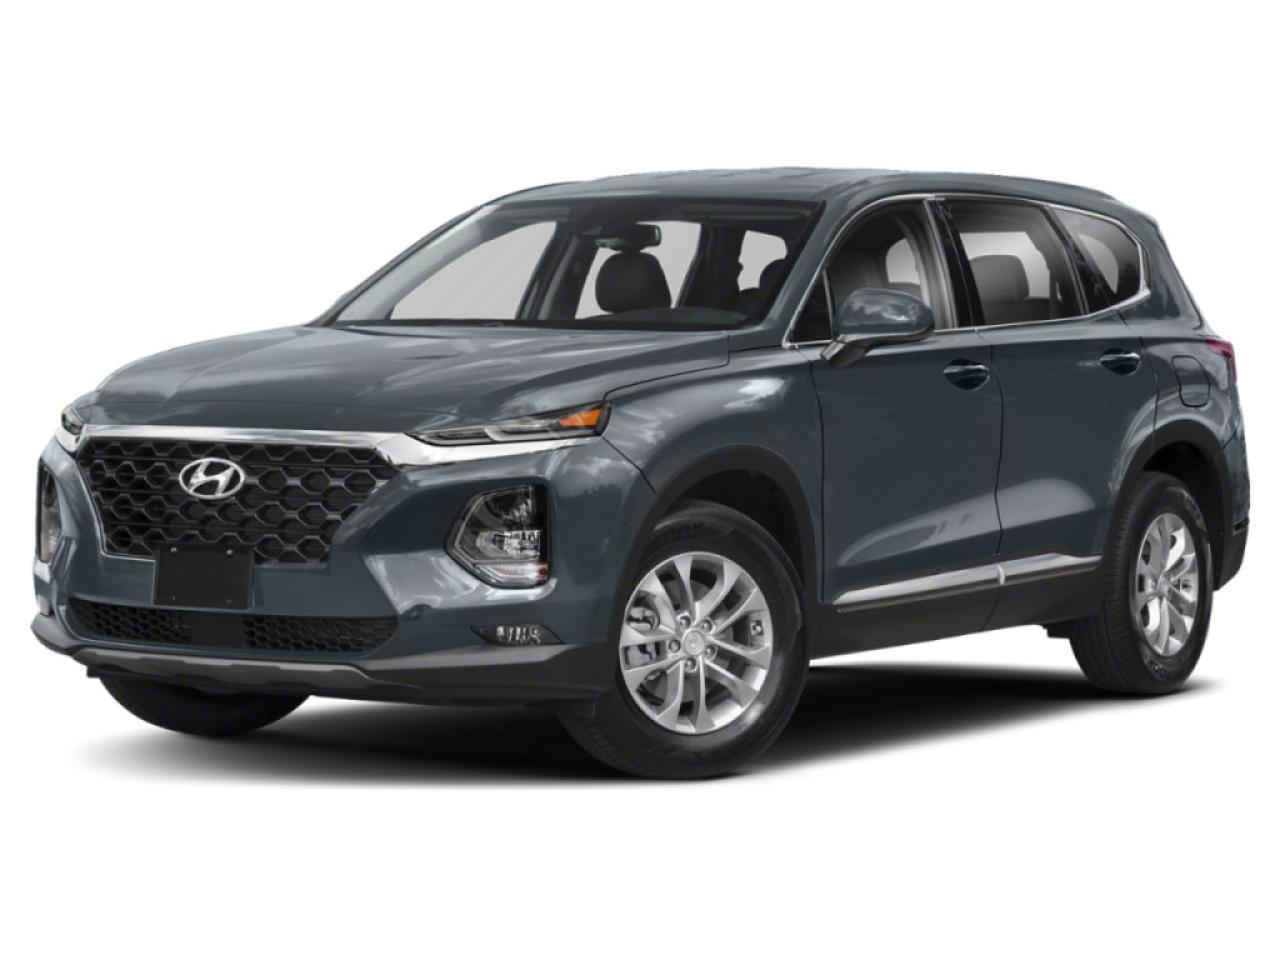 2019 Hyundai Santa Fe 2.0T Luxury AWD NO OPTIONS